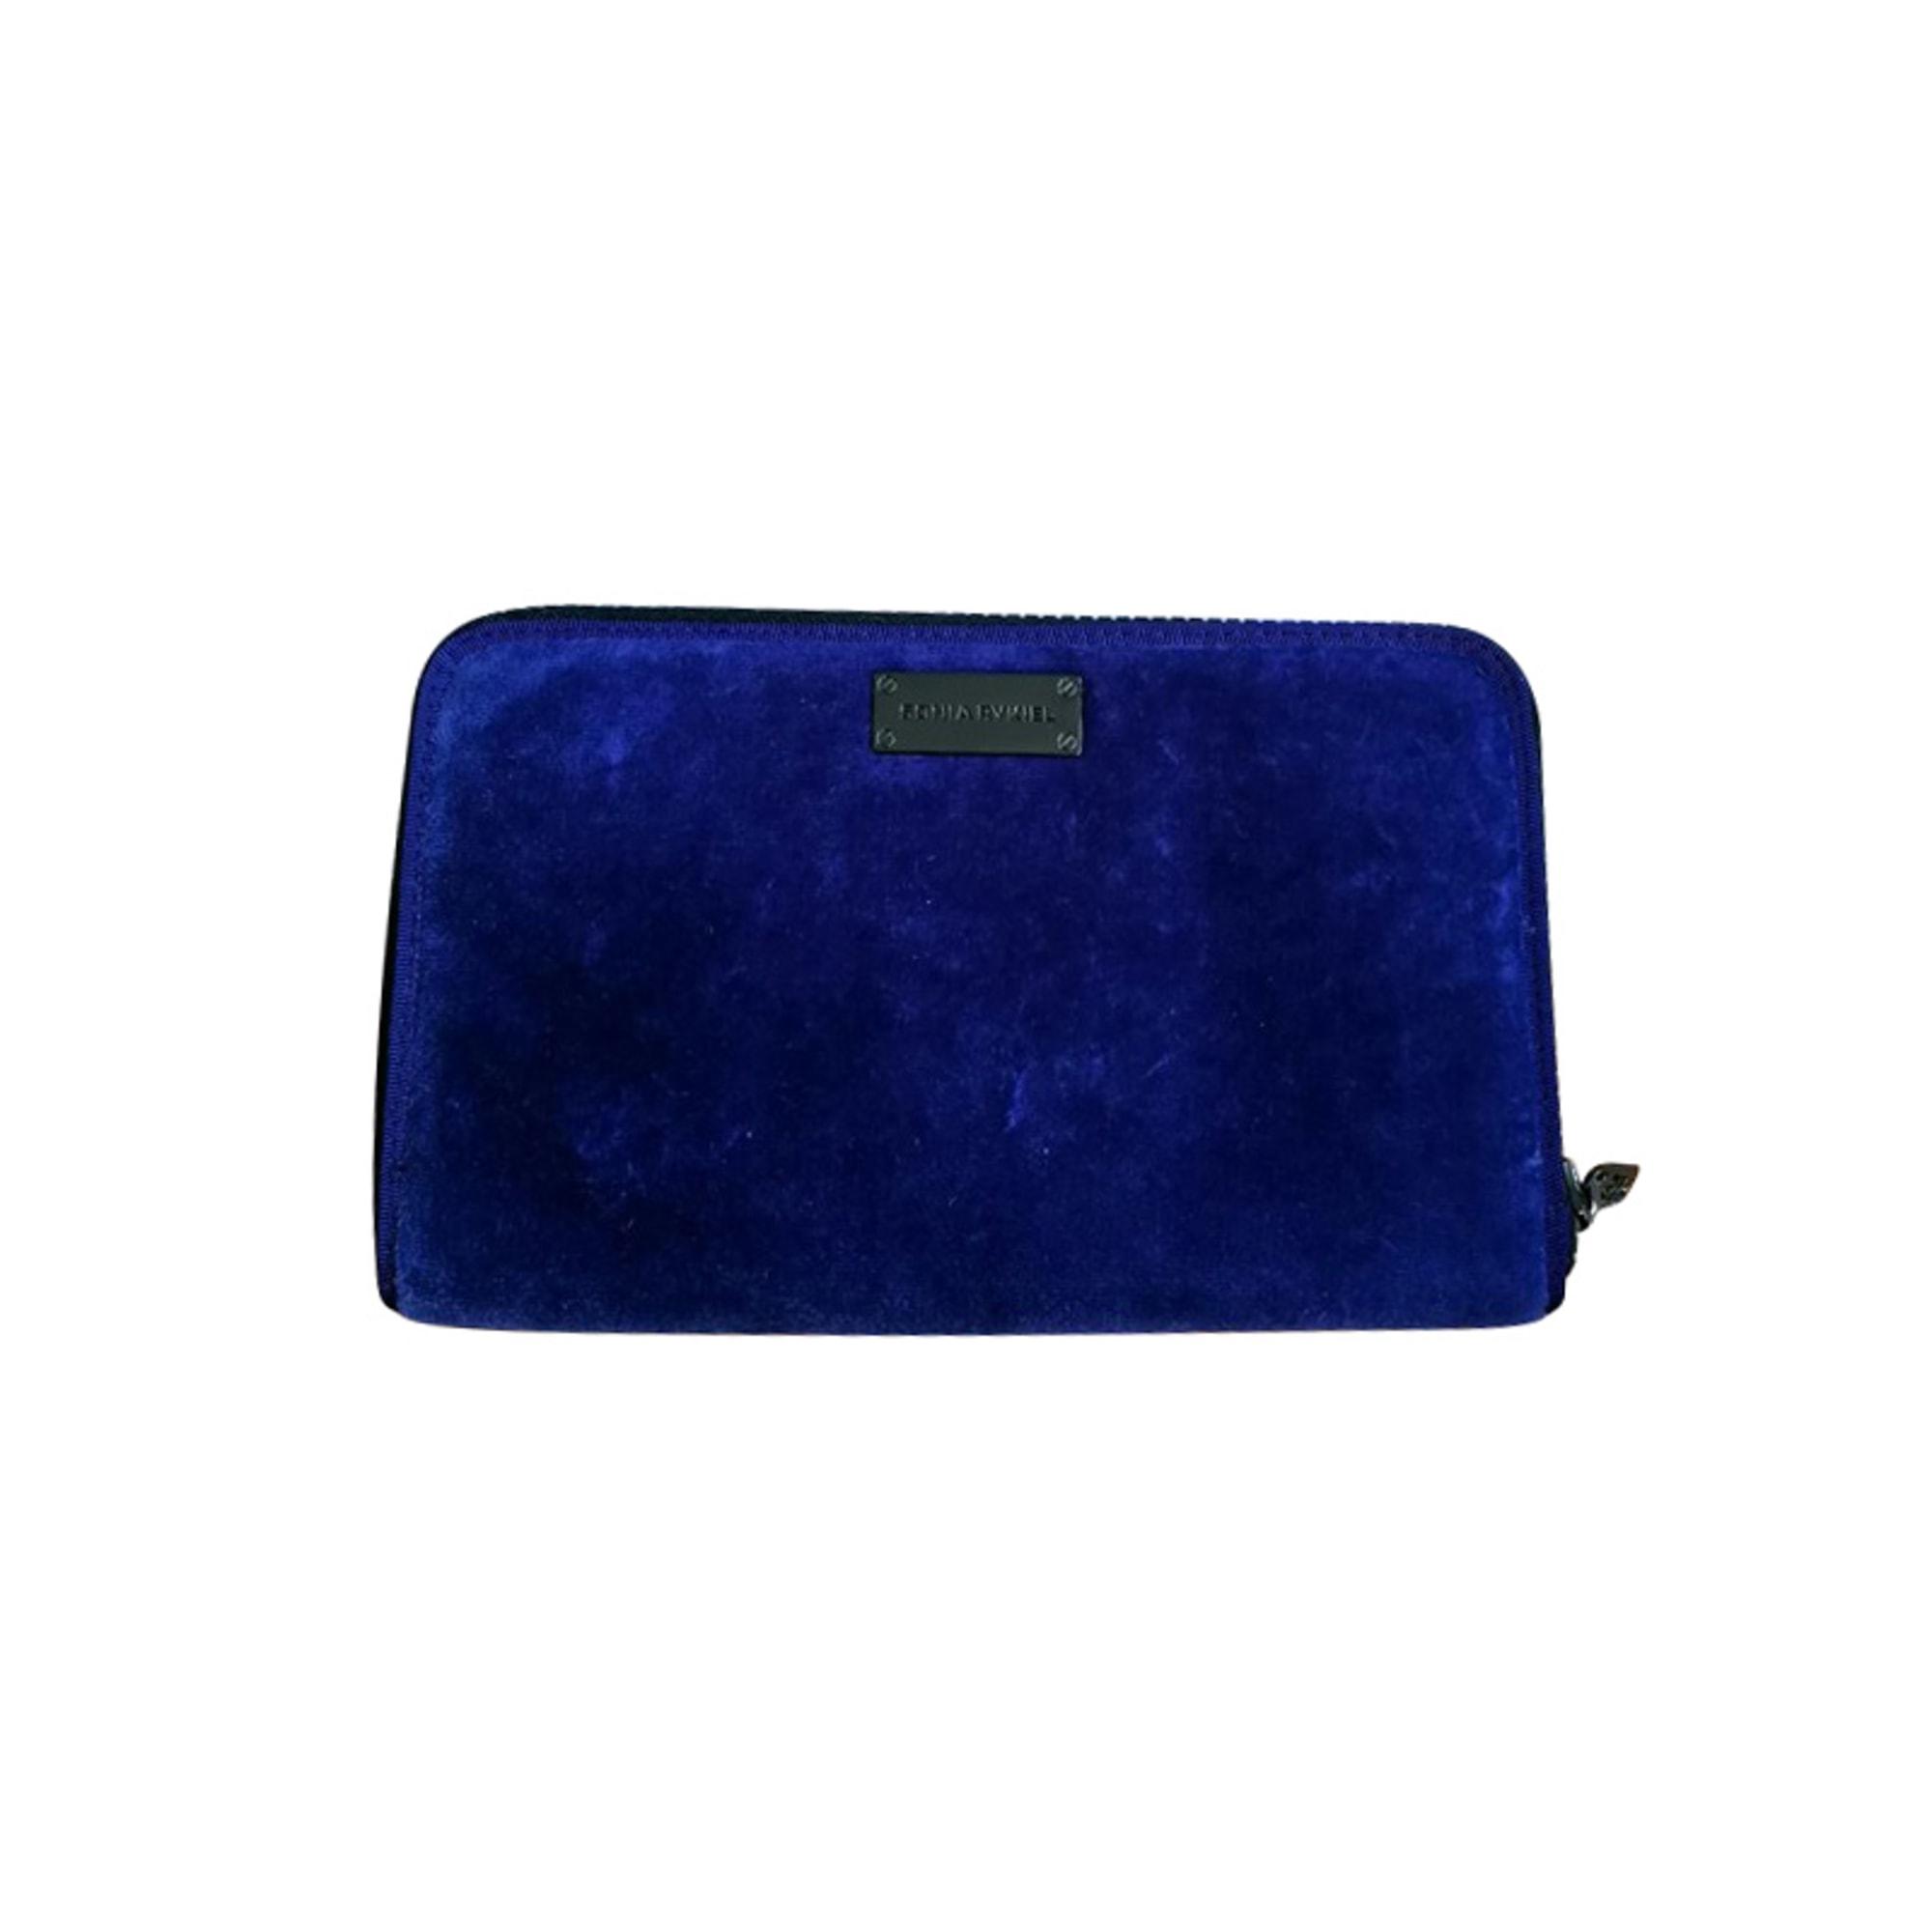 Wallet SONIA RYKIEL Blue, navy, turquoise